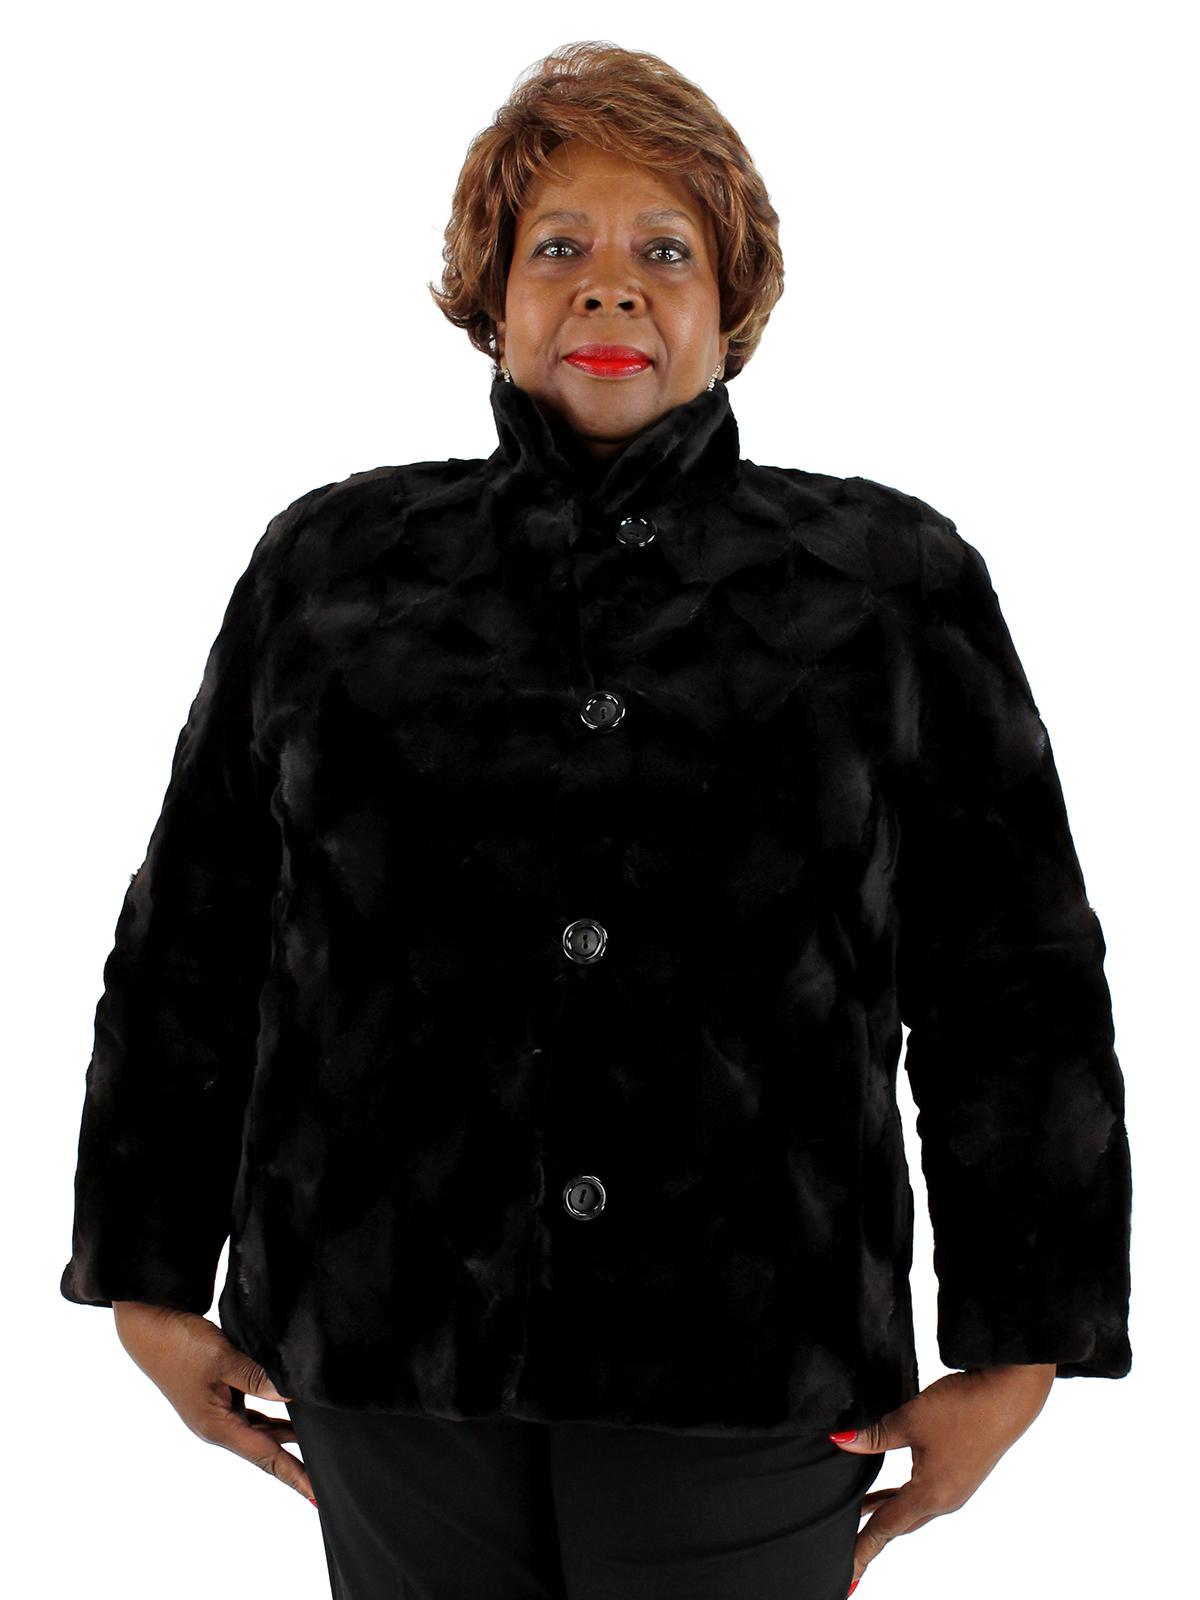 548140d87722 Sheared Mink Fur Jacket Reversible to Rain Fabric - Women s Large ...